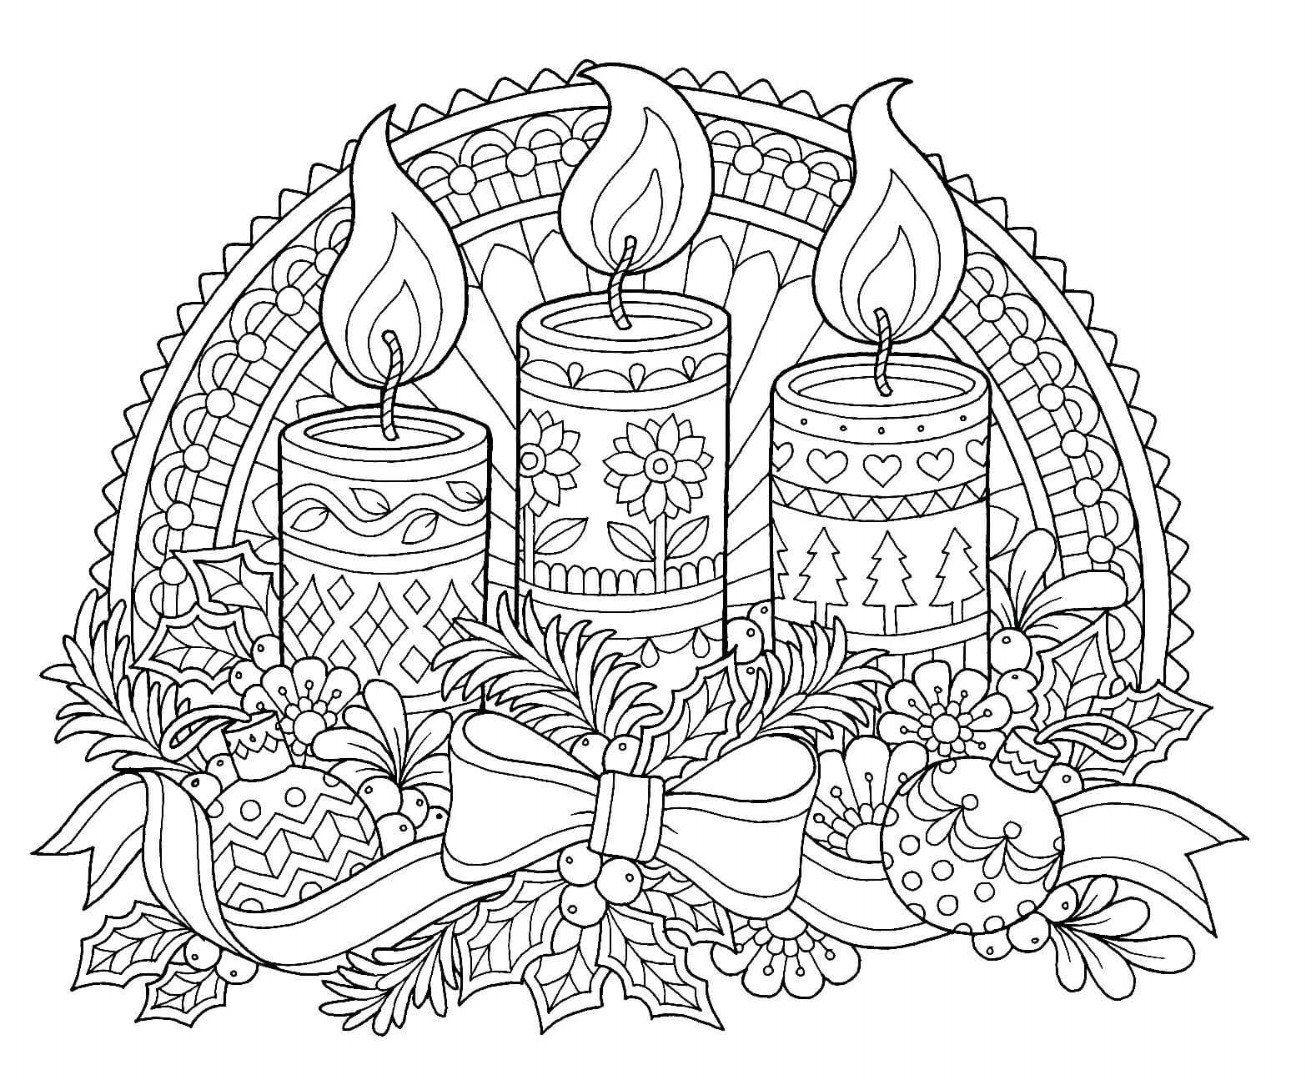 Raskraski Antistress Art Vdohnovenie Hobbi Christmas Coloring Sheets Free Christmas Coloring Pages Christmas Coloring Books